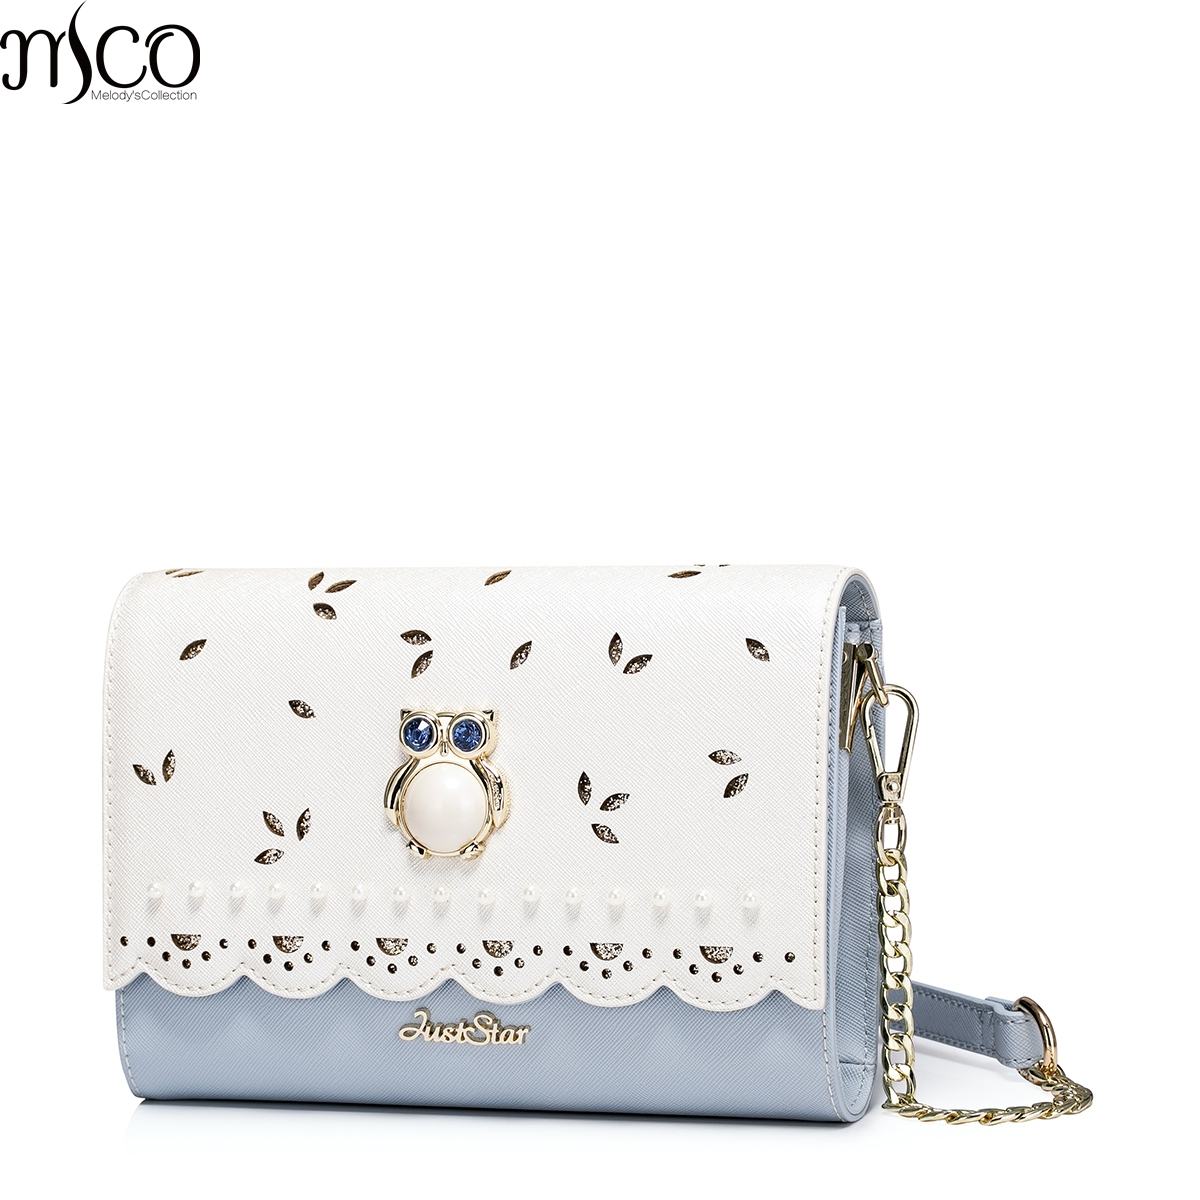 2017 Summer Luxury Diamonds Owl Small Clutch Bags For Women Elegant Hollow Out OL Messenger Shoulder Bags Flap Envolope HandBag недорго, оригинальная цена